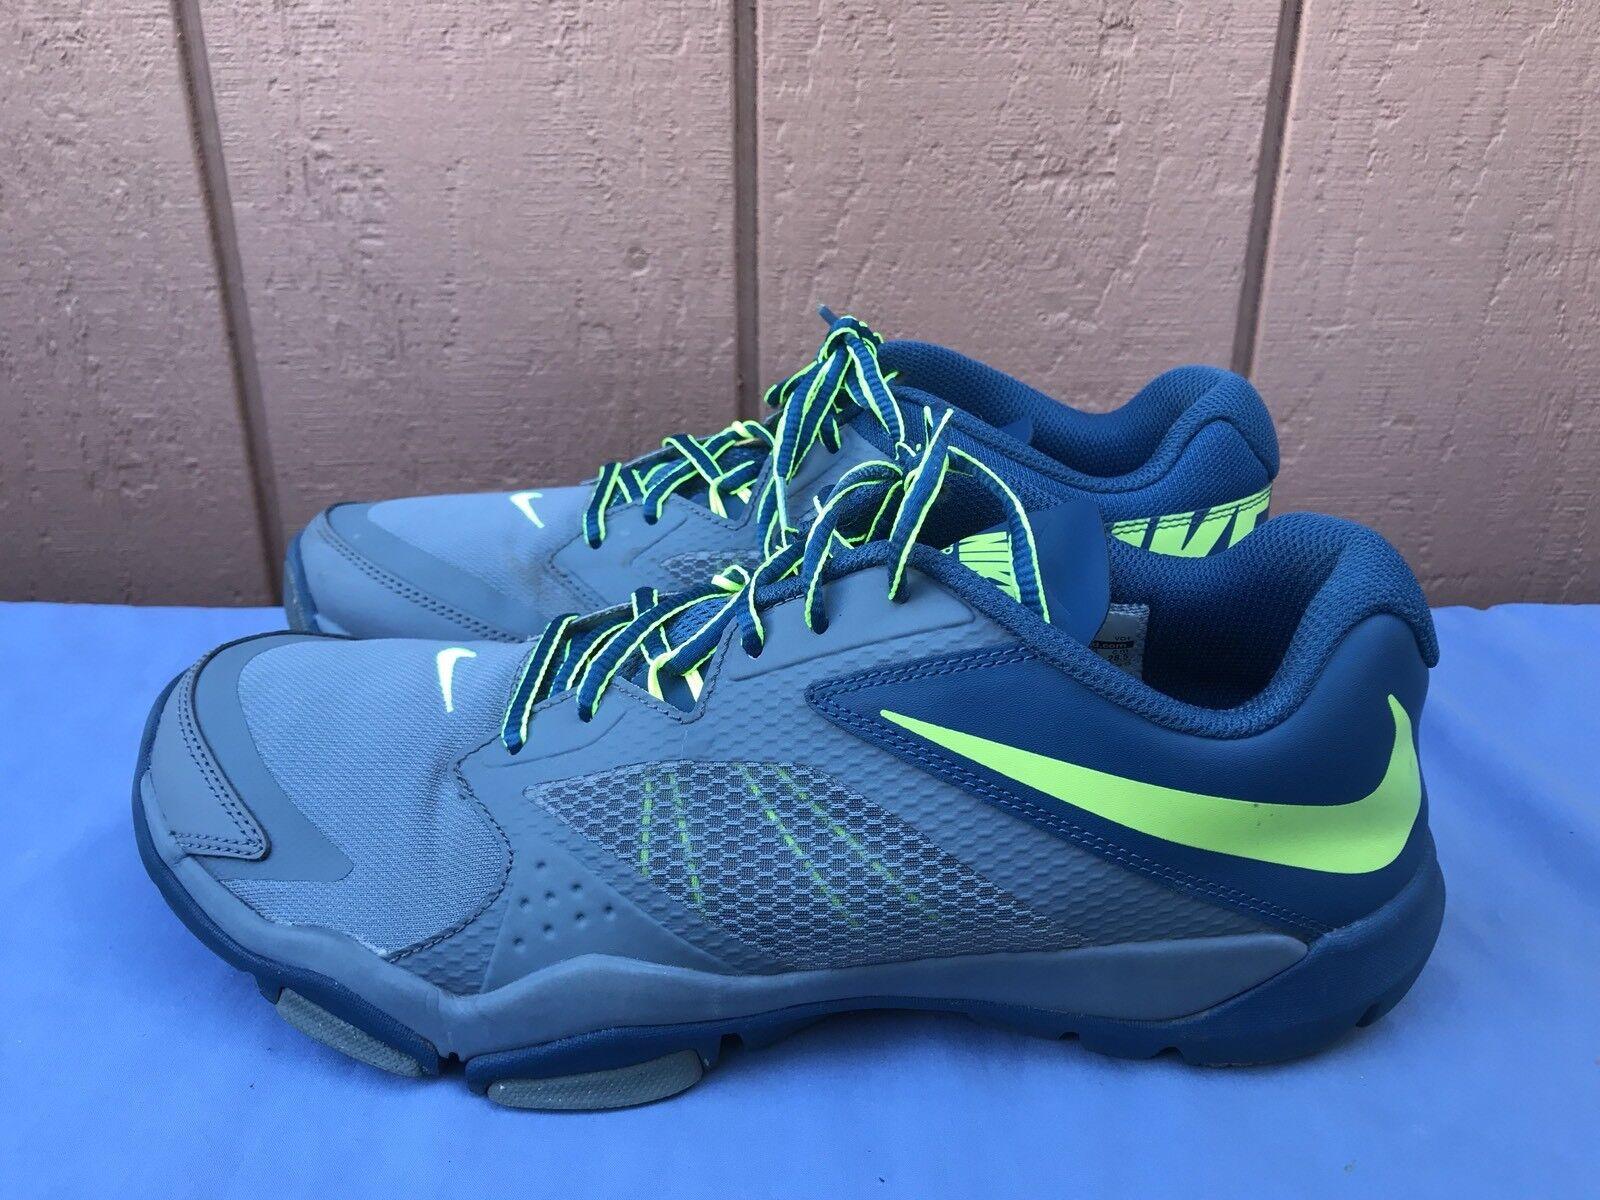 37cf46c084bc6a EUC NIKE Flex Flex Flex Supreme Training 3 US 10.5 Gray Blue Green Shoes  653620-400 A7 a97cb0